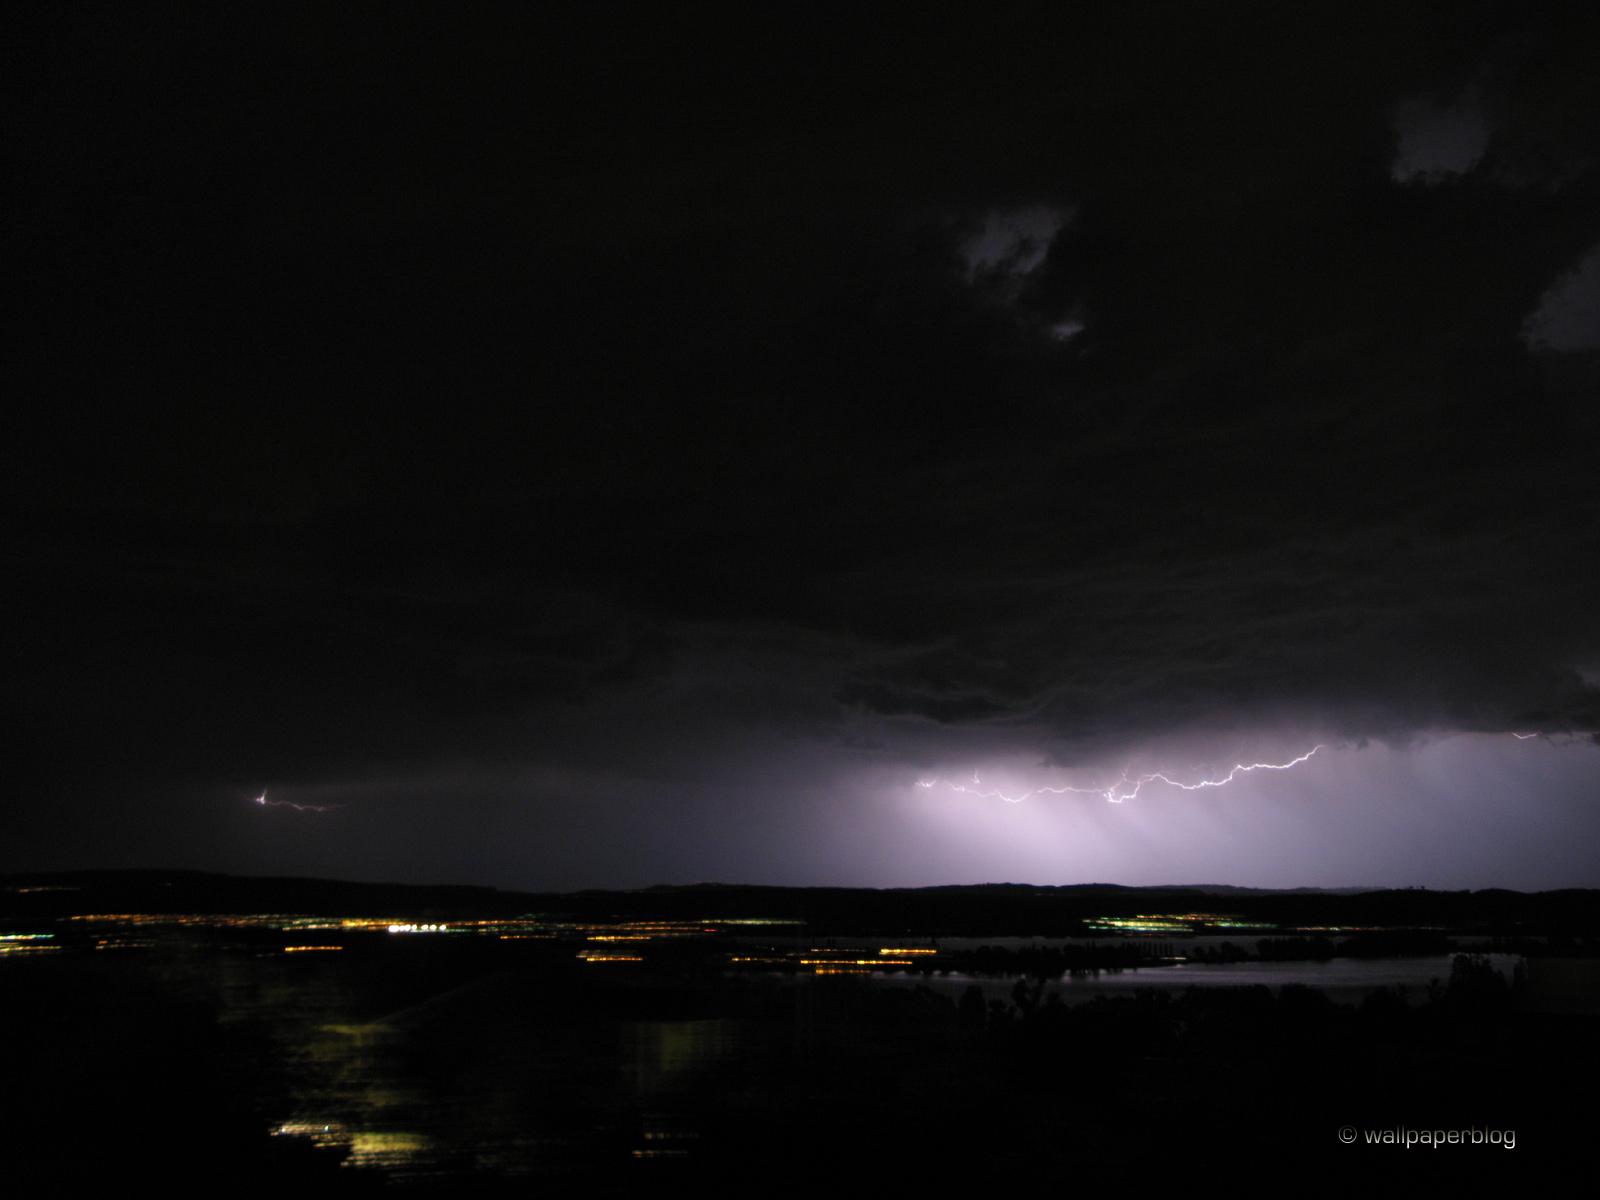 Thunderstorm 1600 pixel 1600x1200